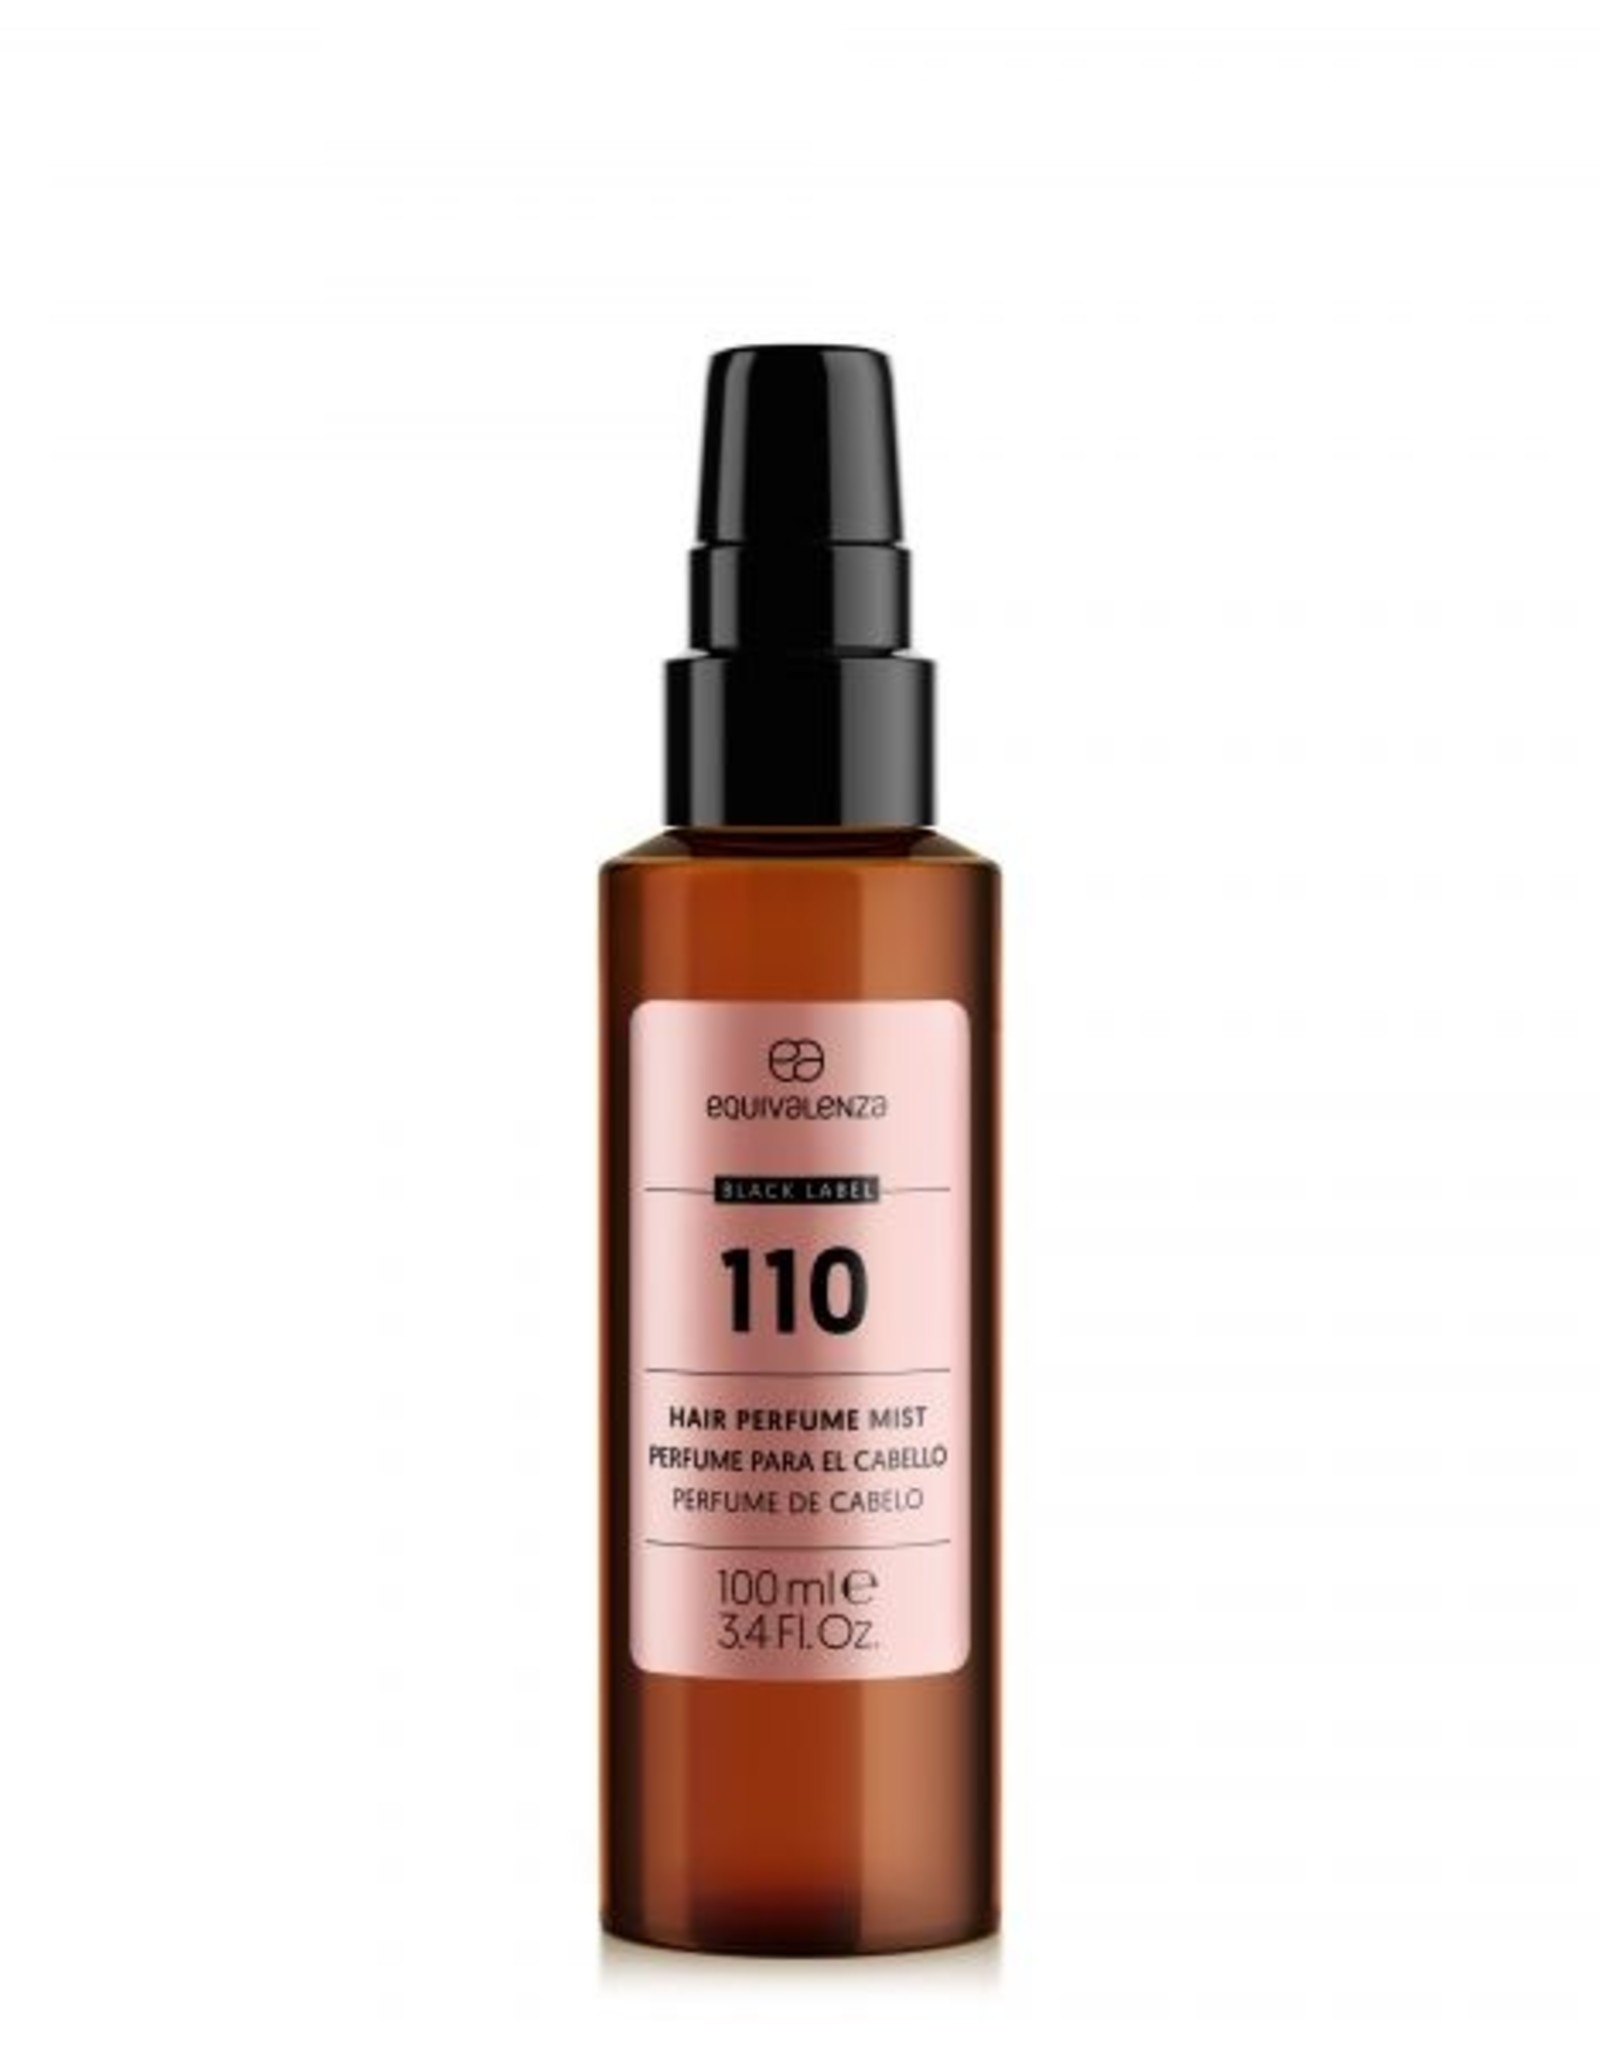 Equivalenza Black Label Hair Perfume Mist 110